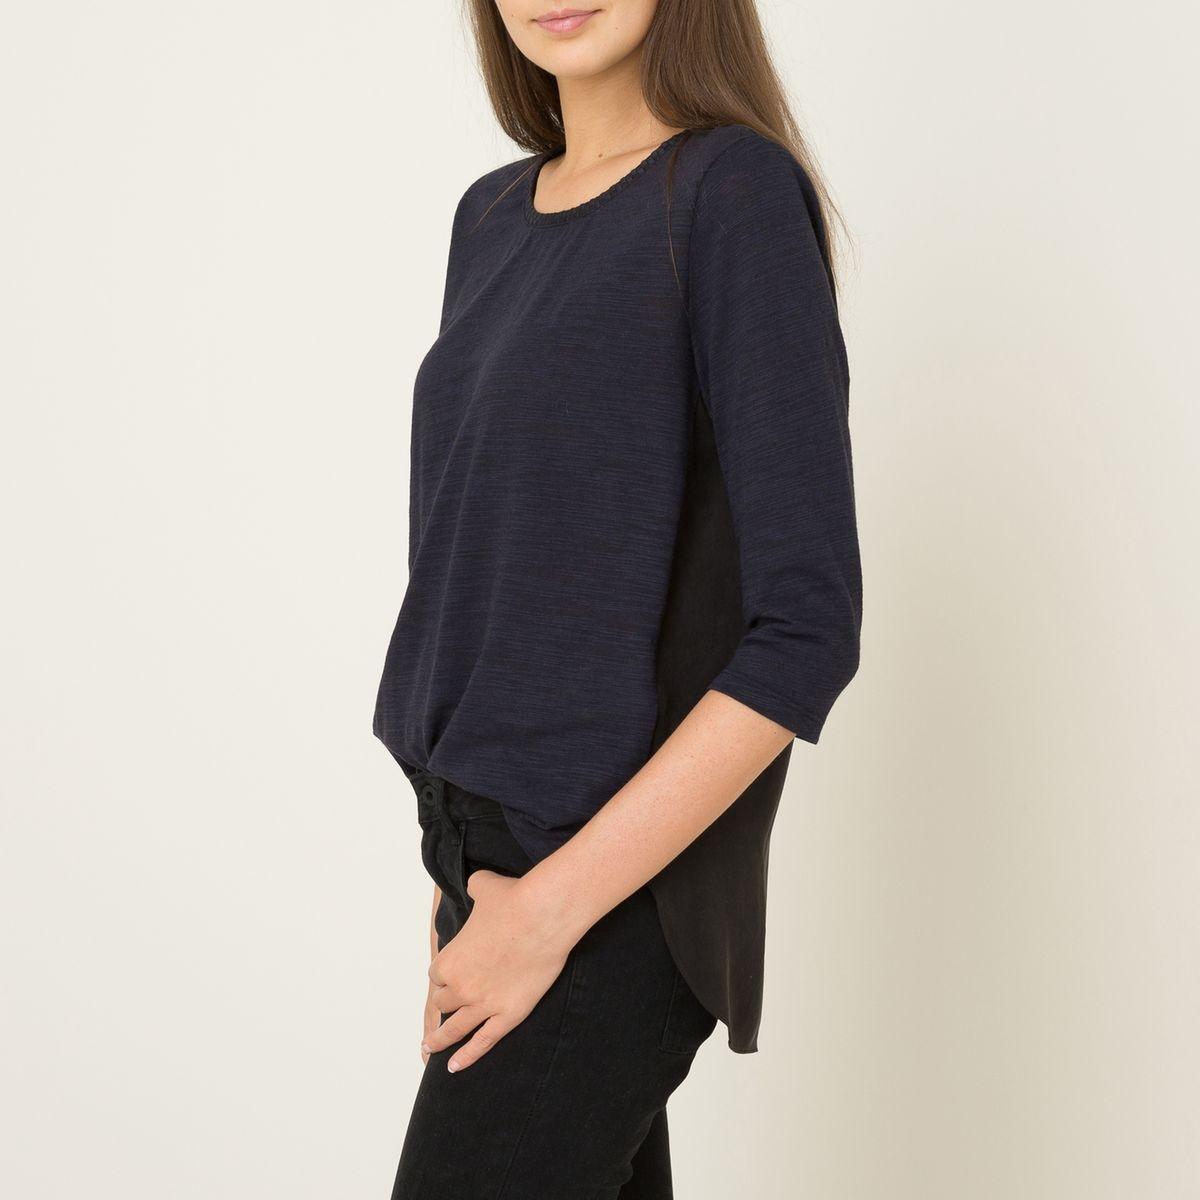 Debardeur Feminine Jersey Top with Woven 100220-B